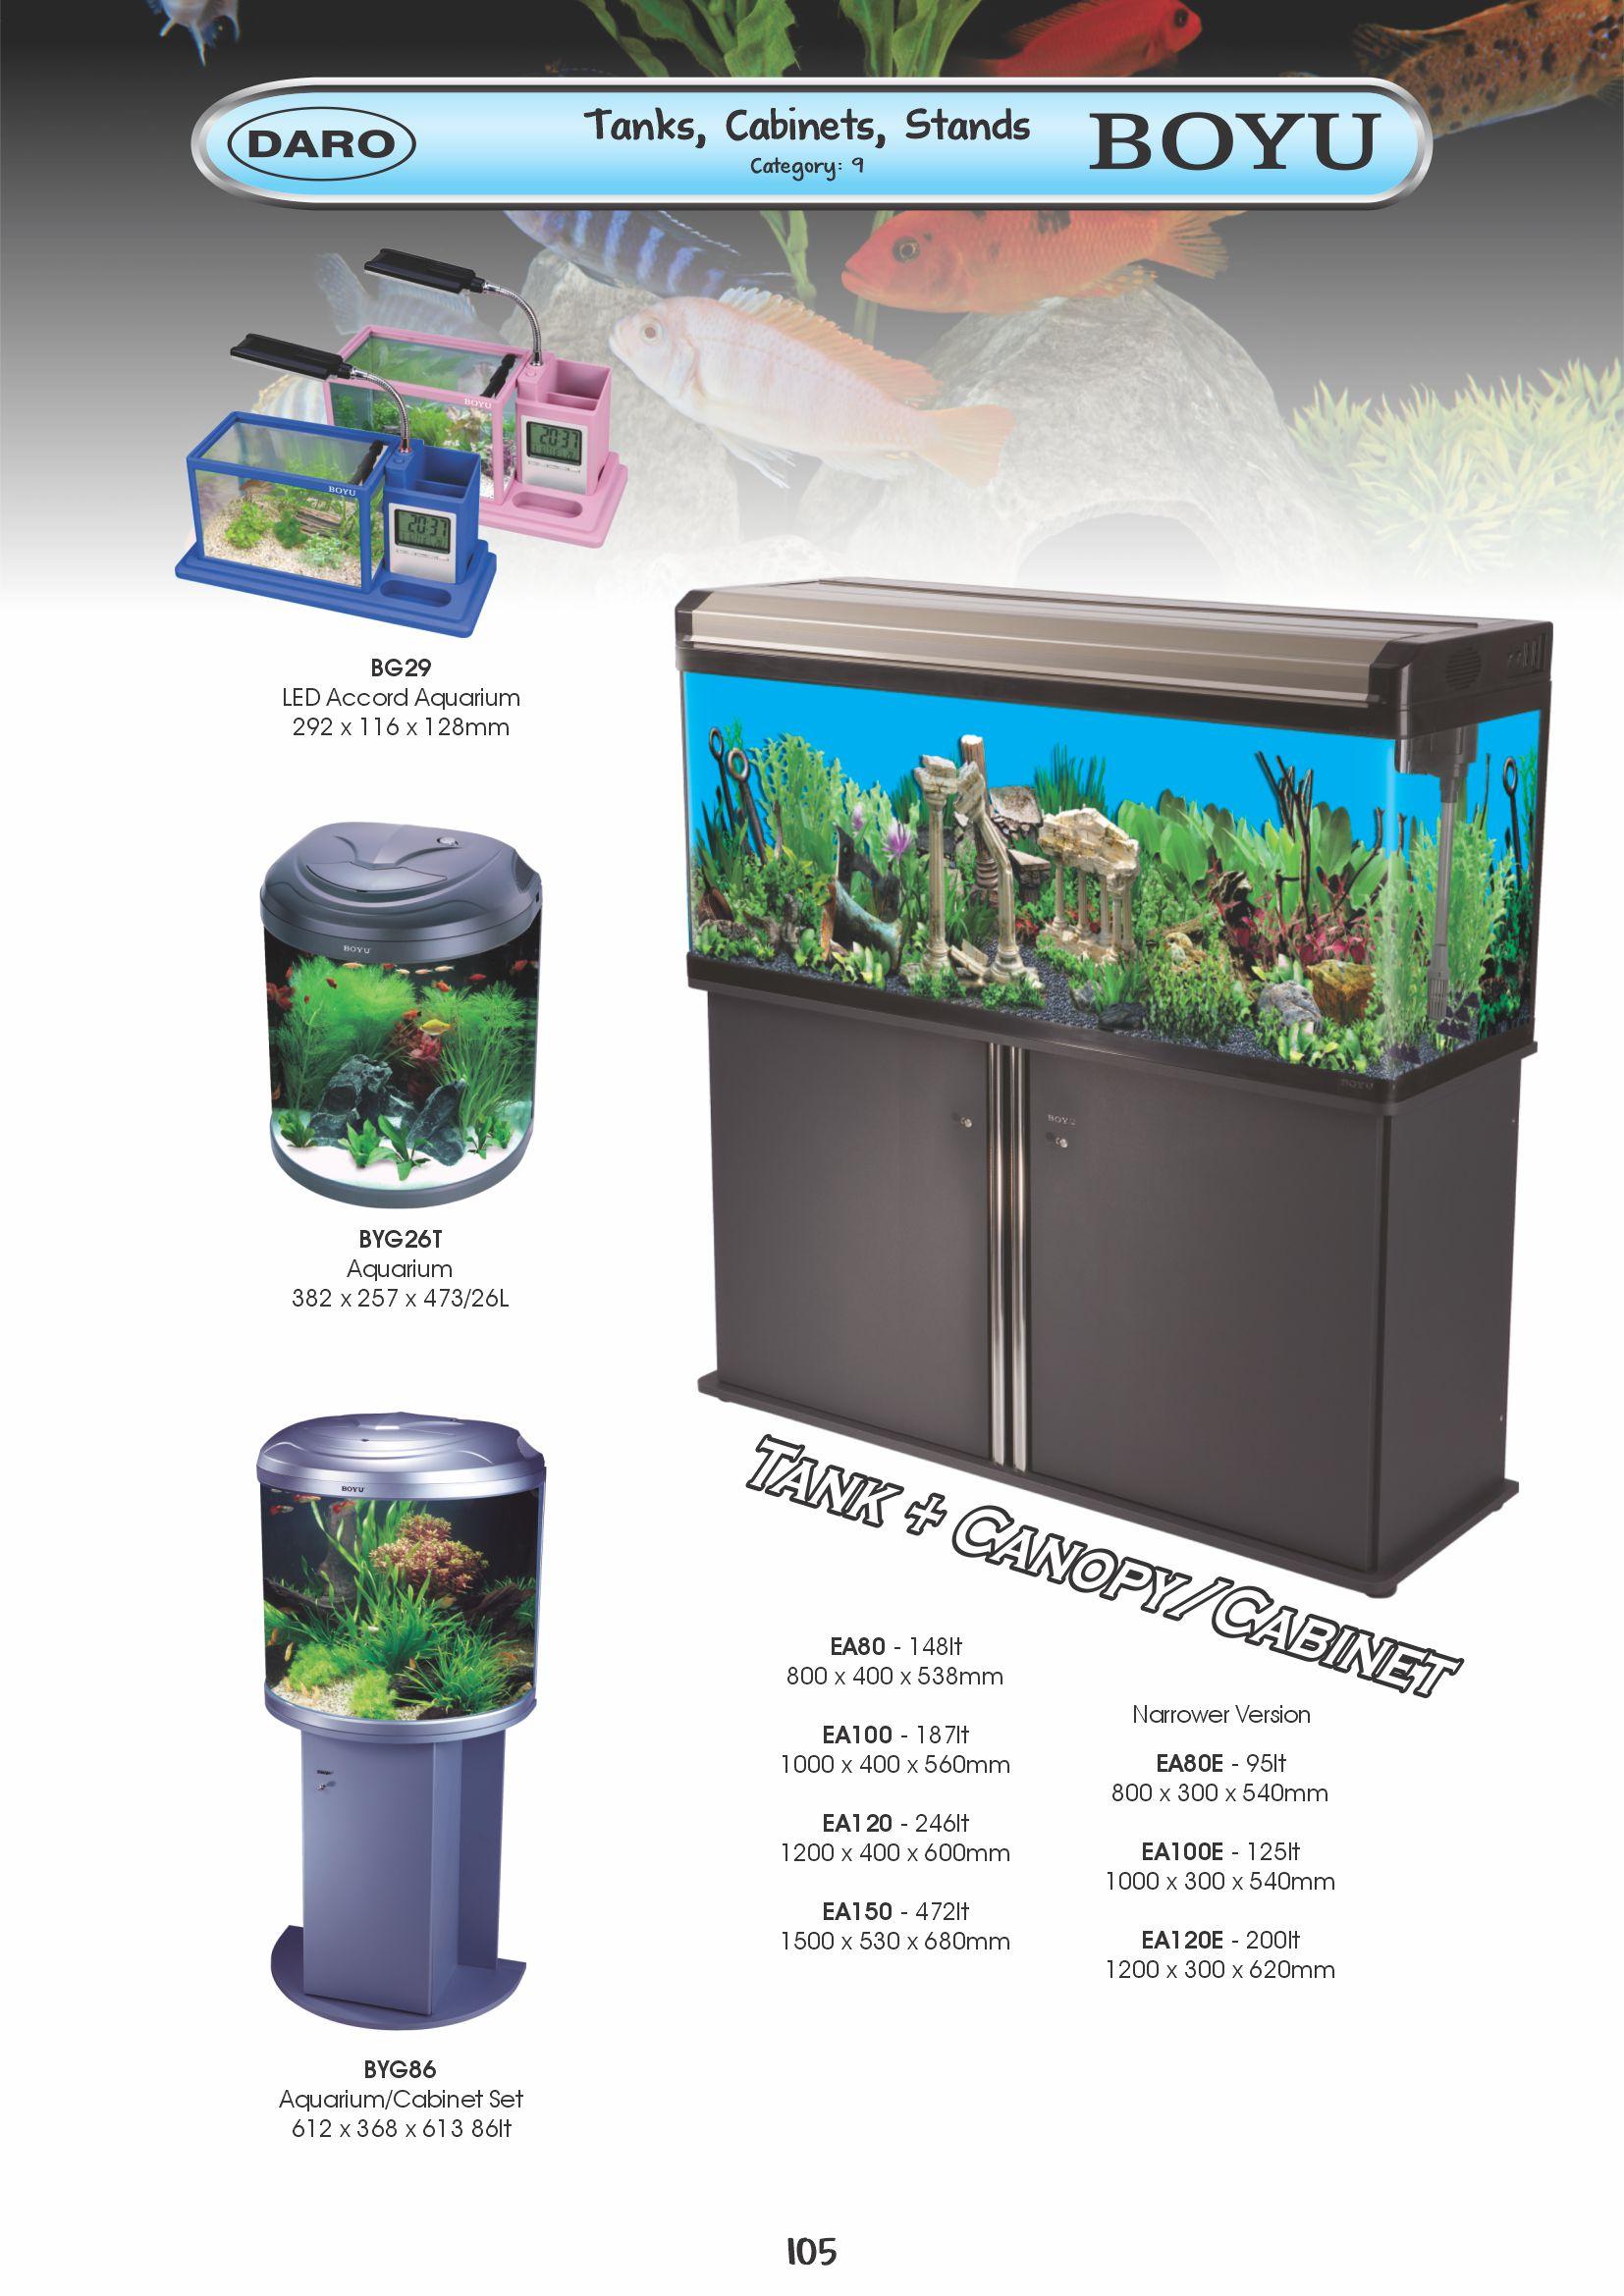 Fish tank cabinet za - Boyu Tanks Sets